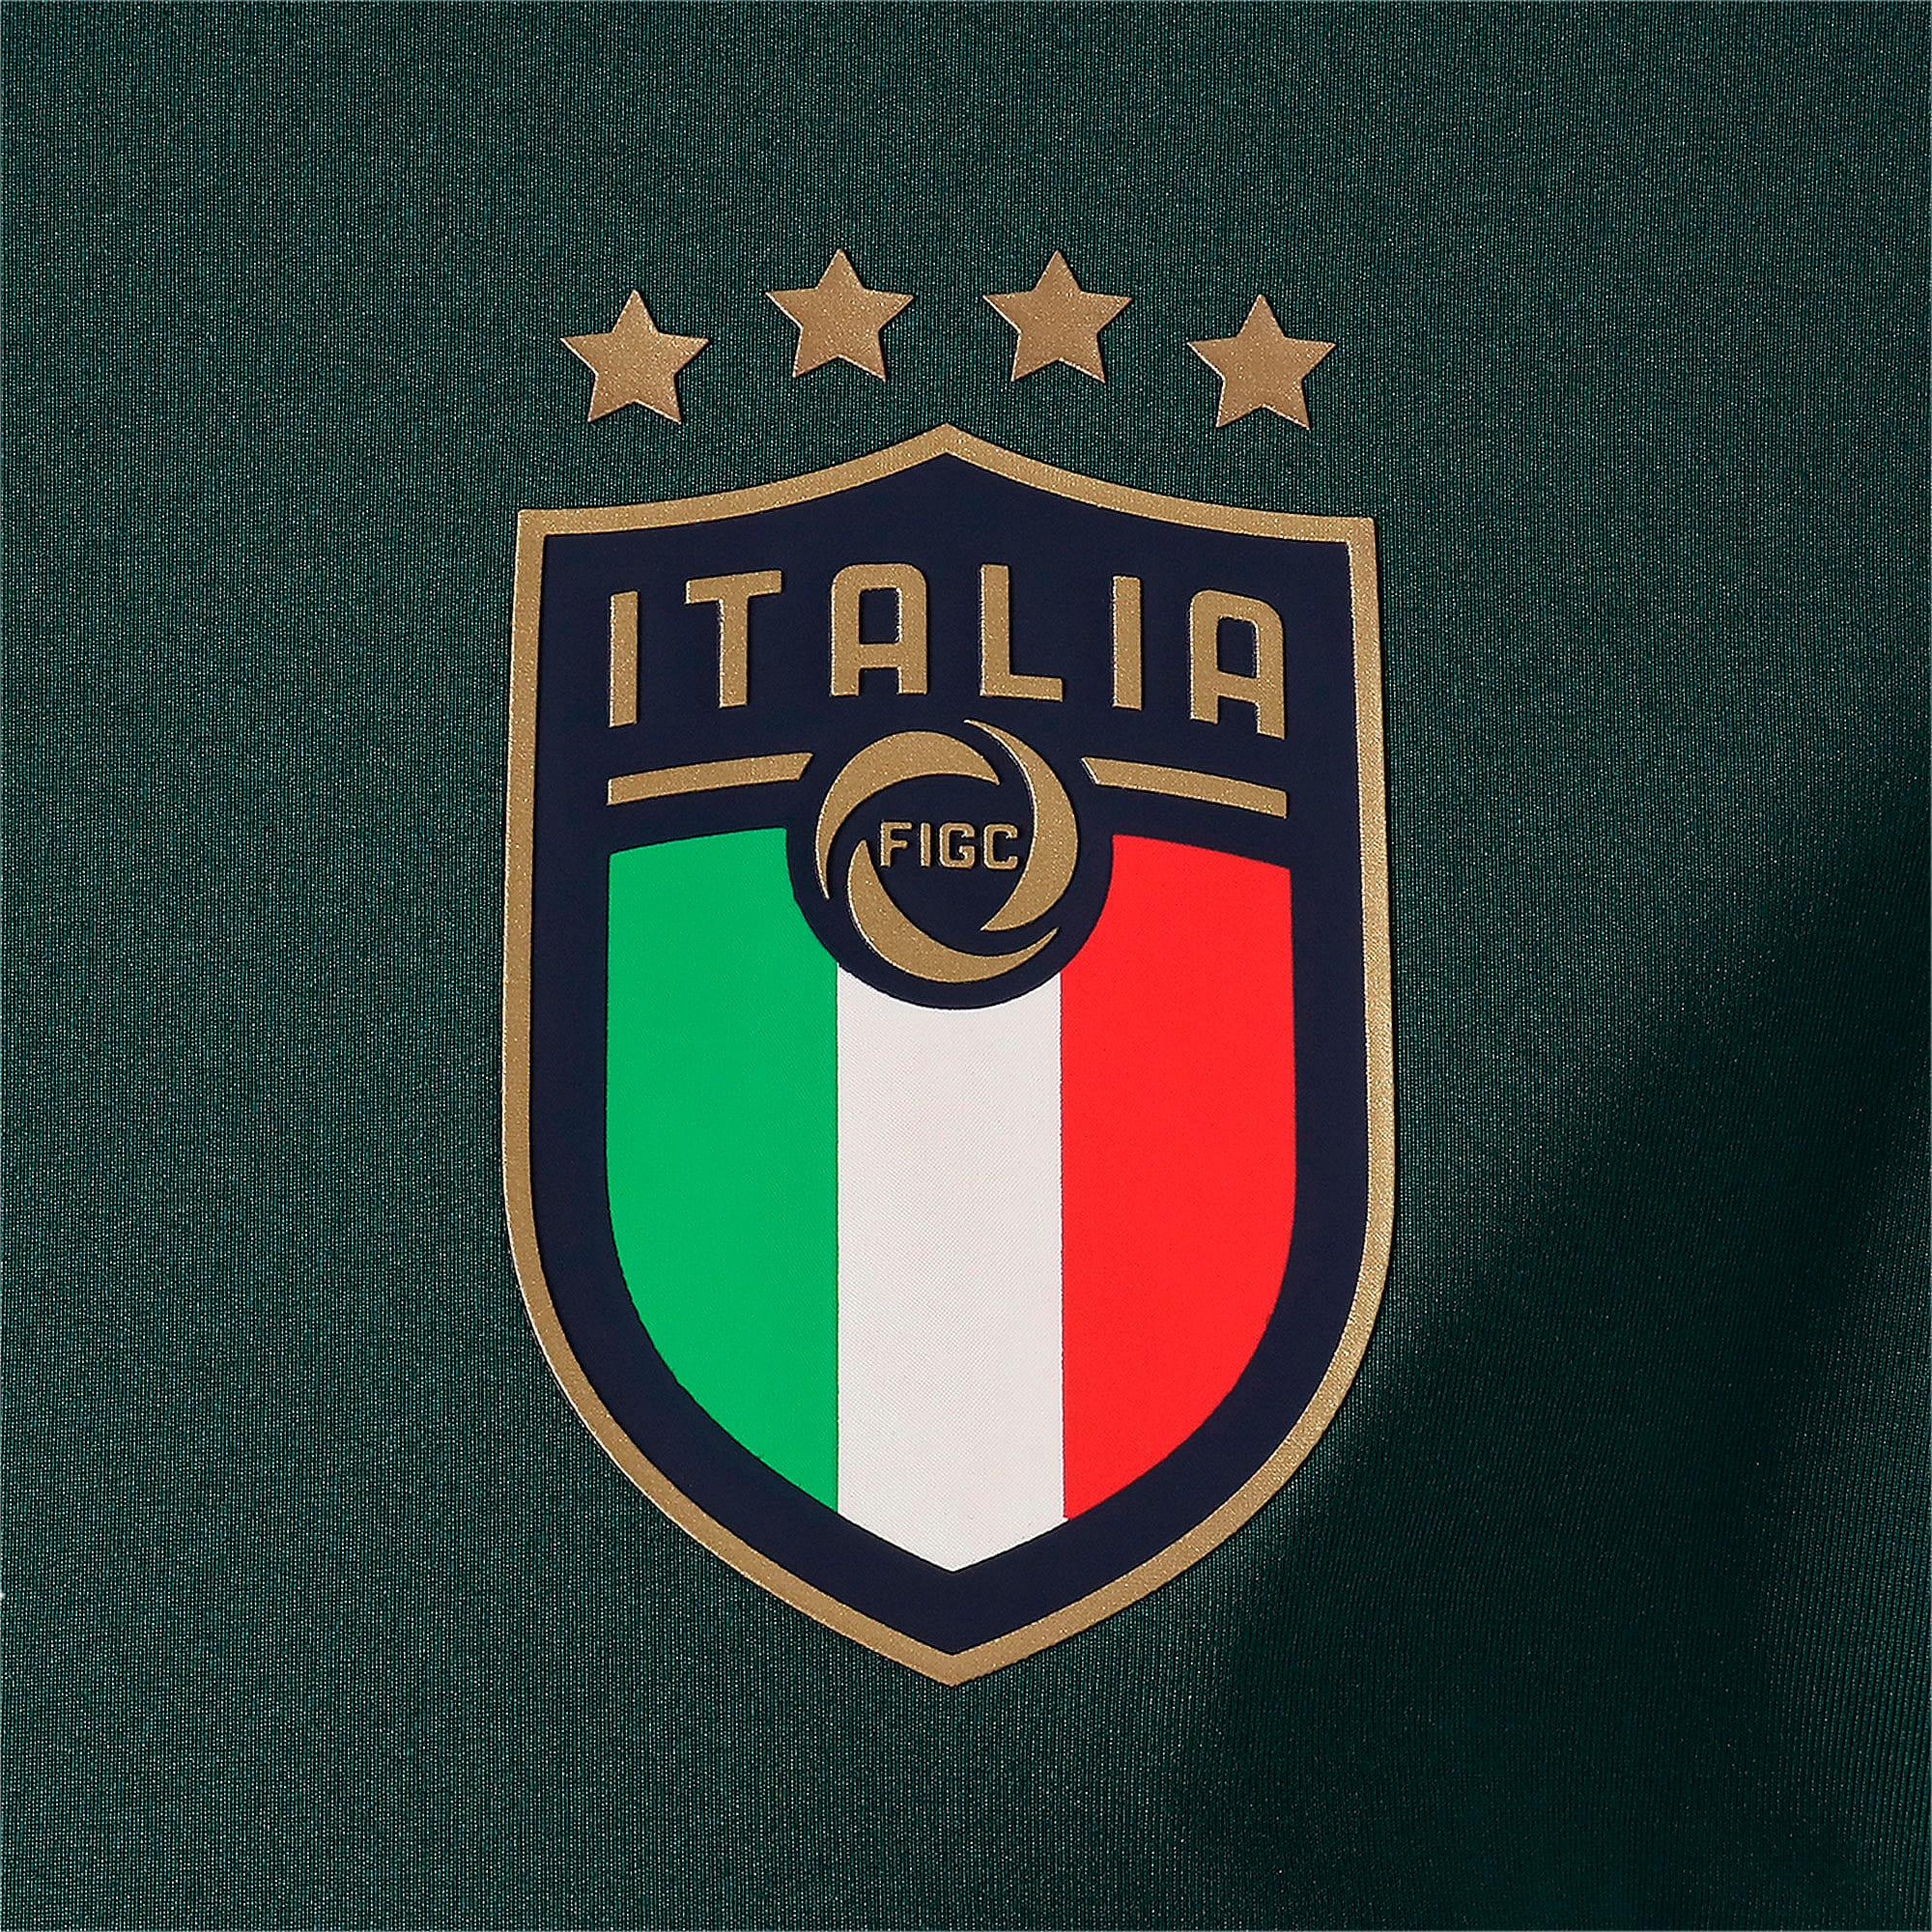 Thumbnail 8 of FIGC イタリア トレーニング 1/4 ジップトップ, Ponderosa Pine-Peacoat, medium-JPN